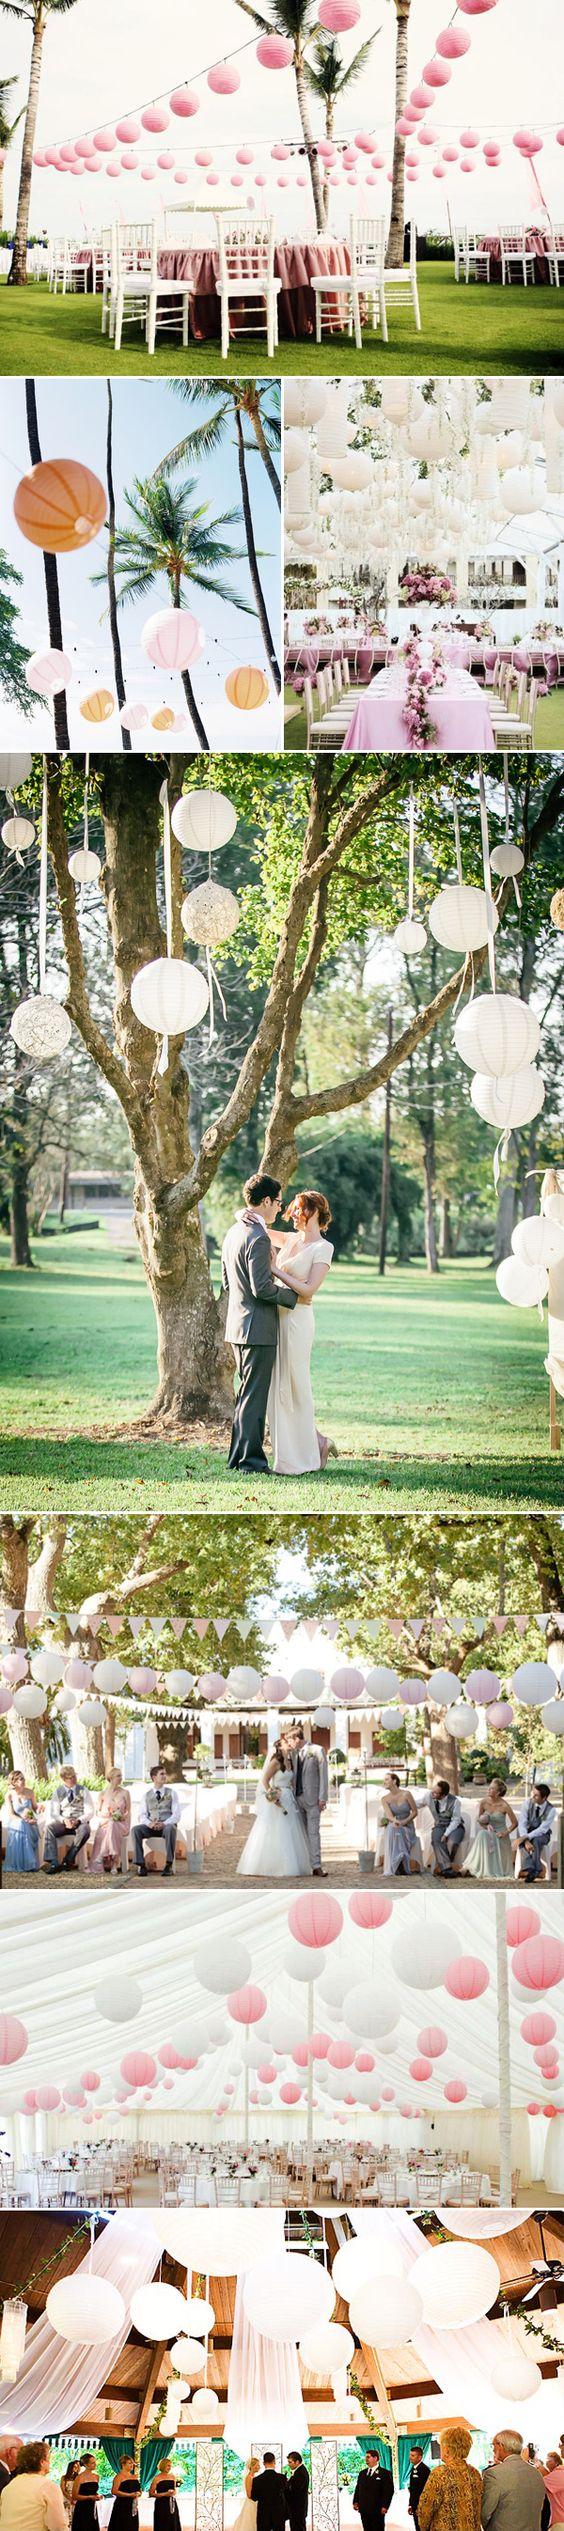 21 Lantern Wedding Decor Ideas - Romantic…